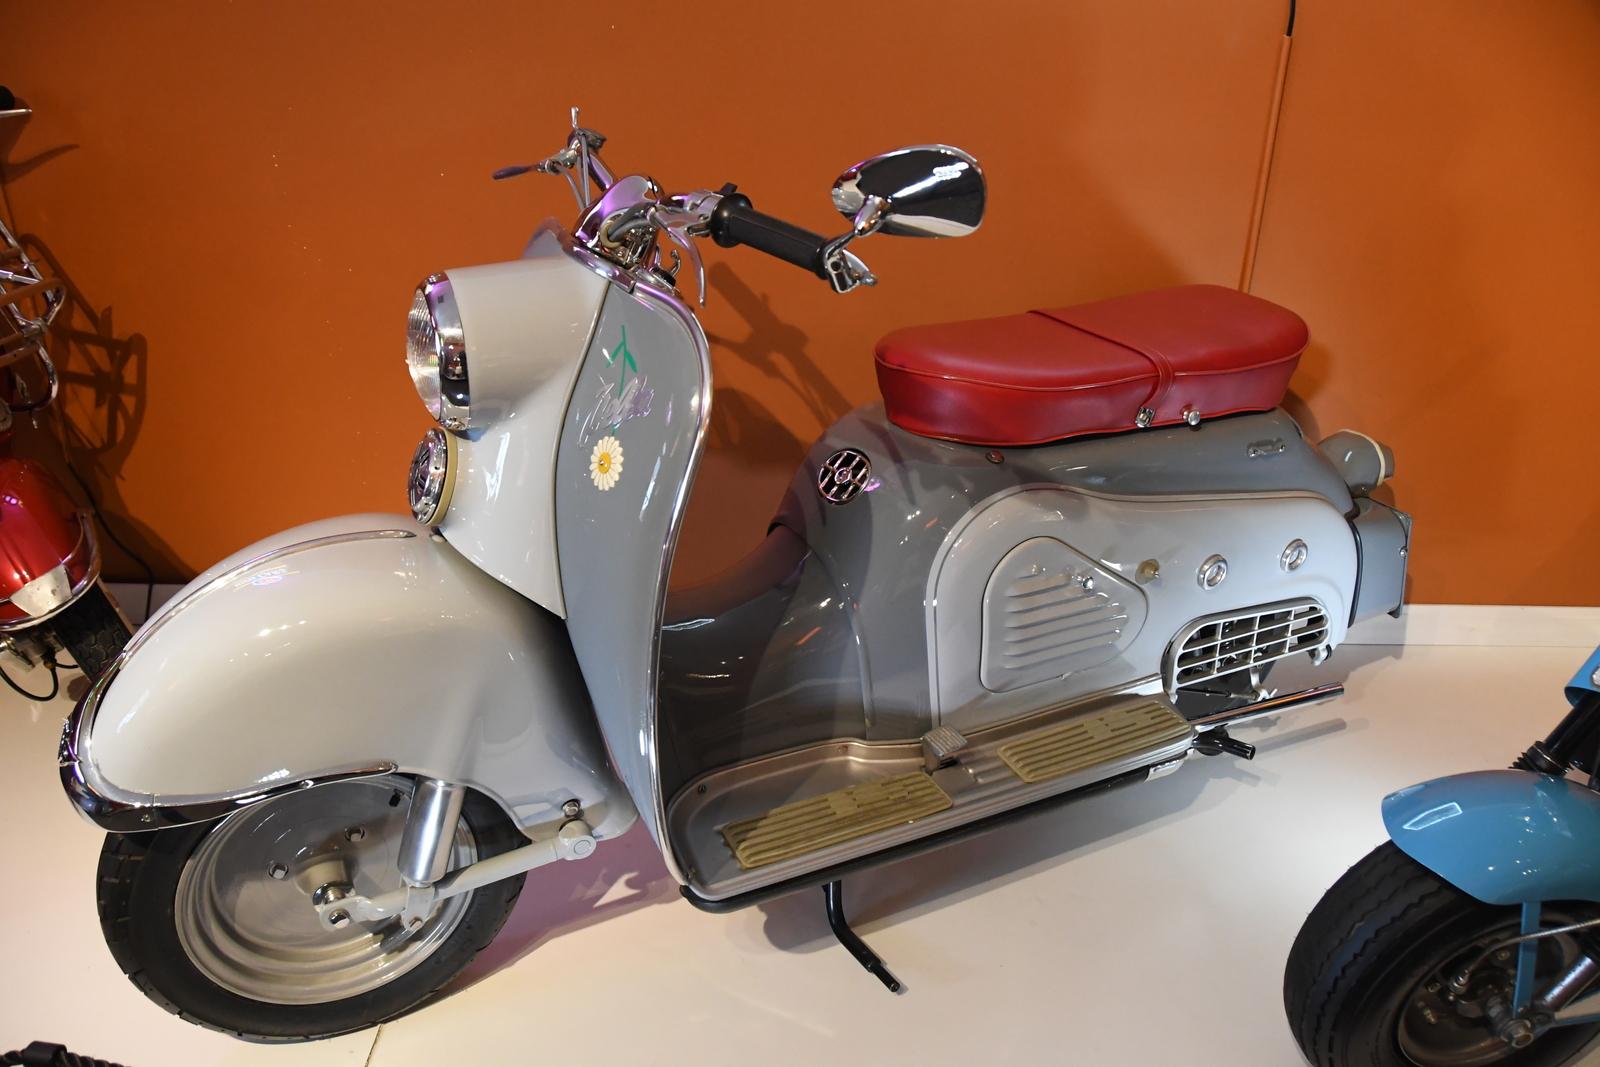 Zundapp scooter